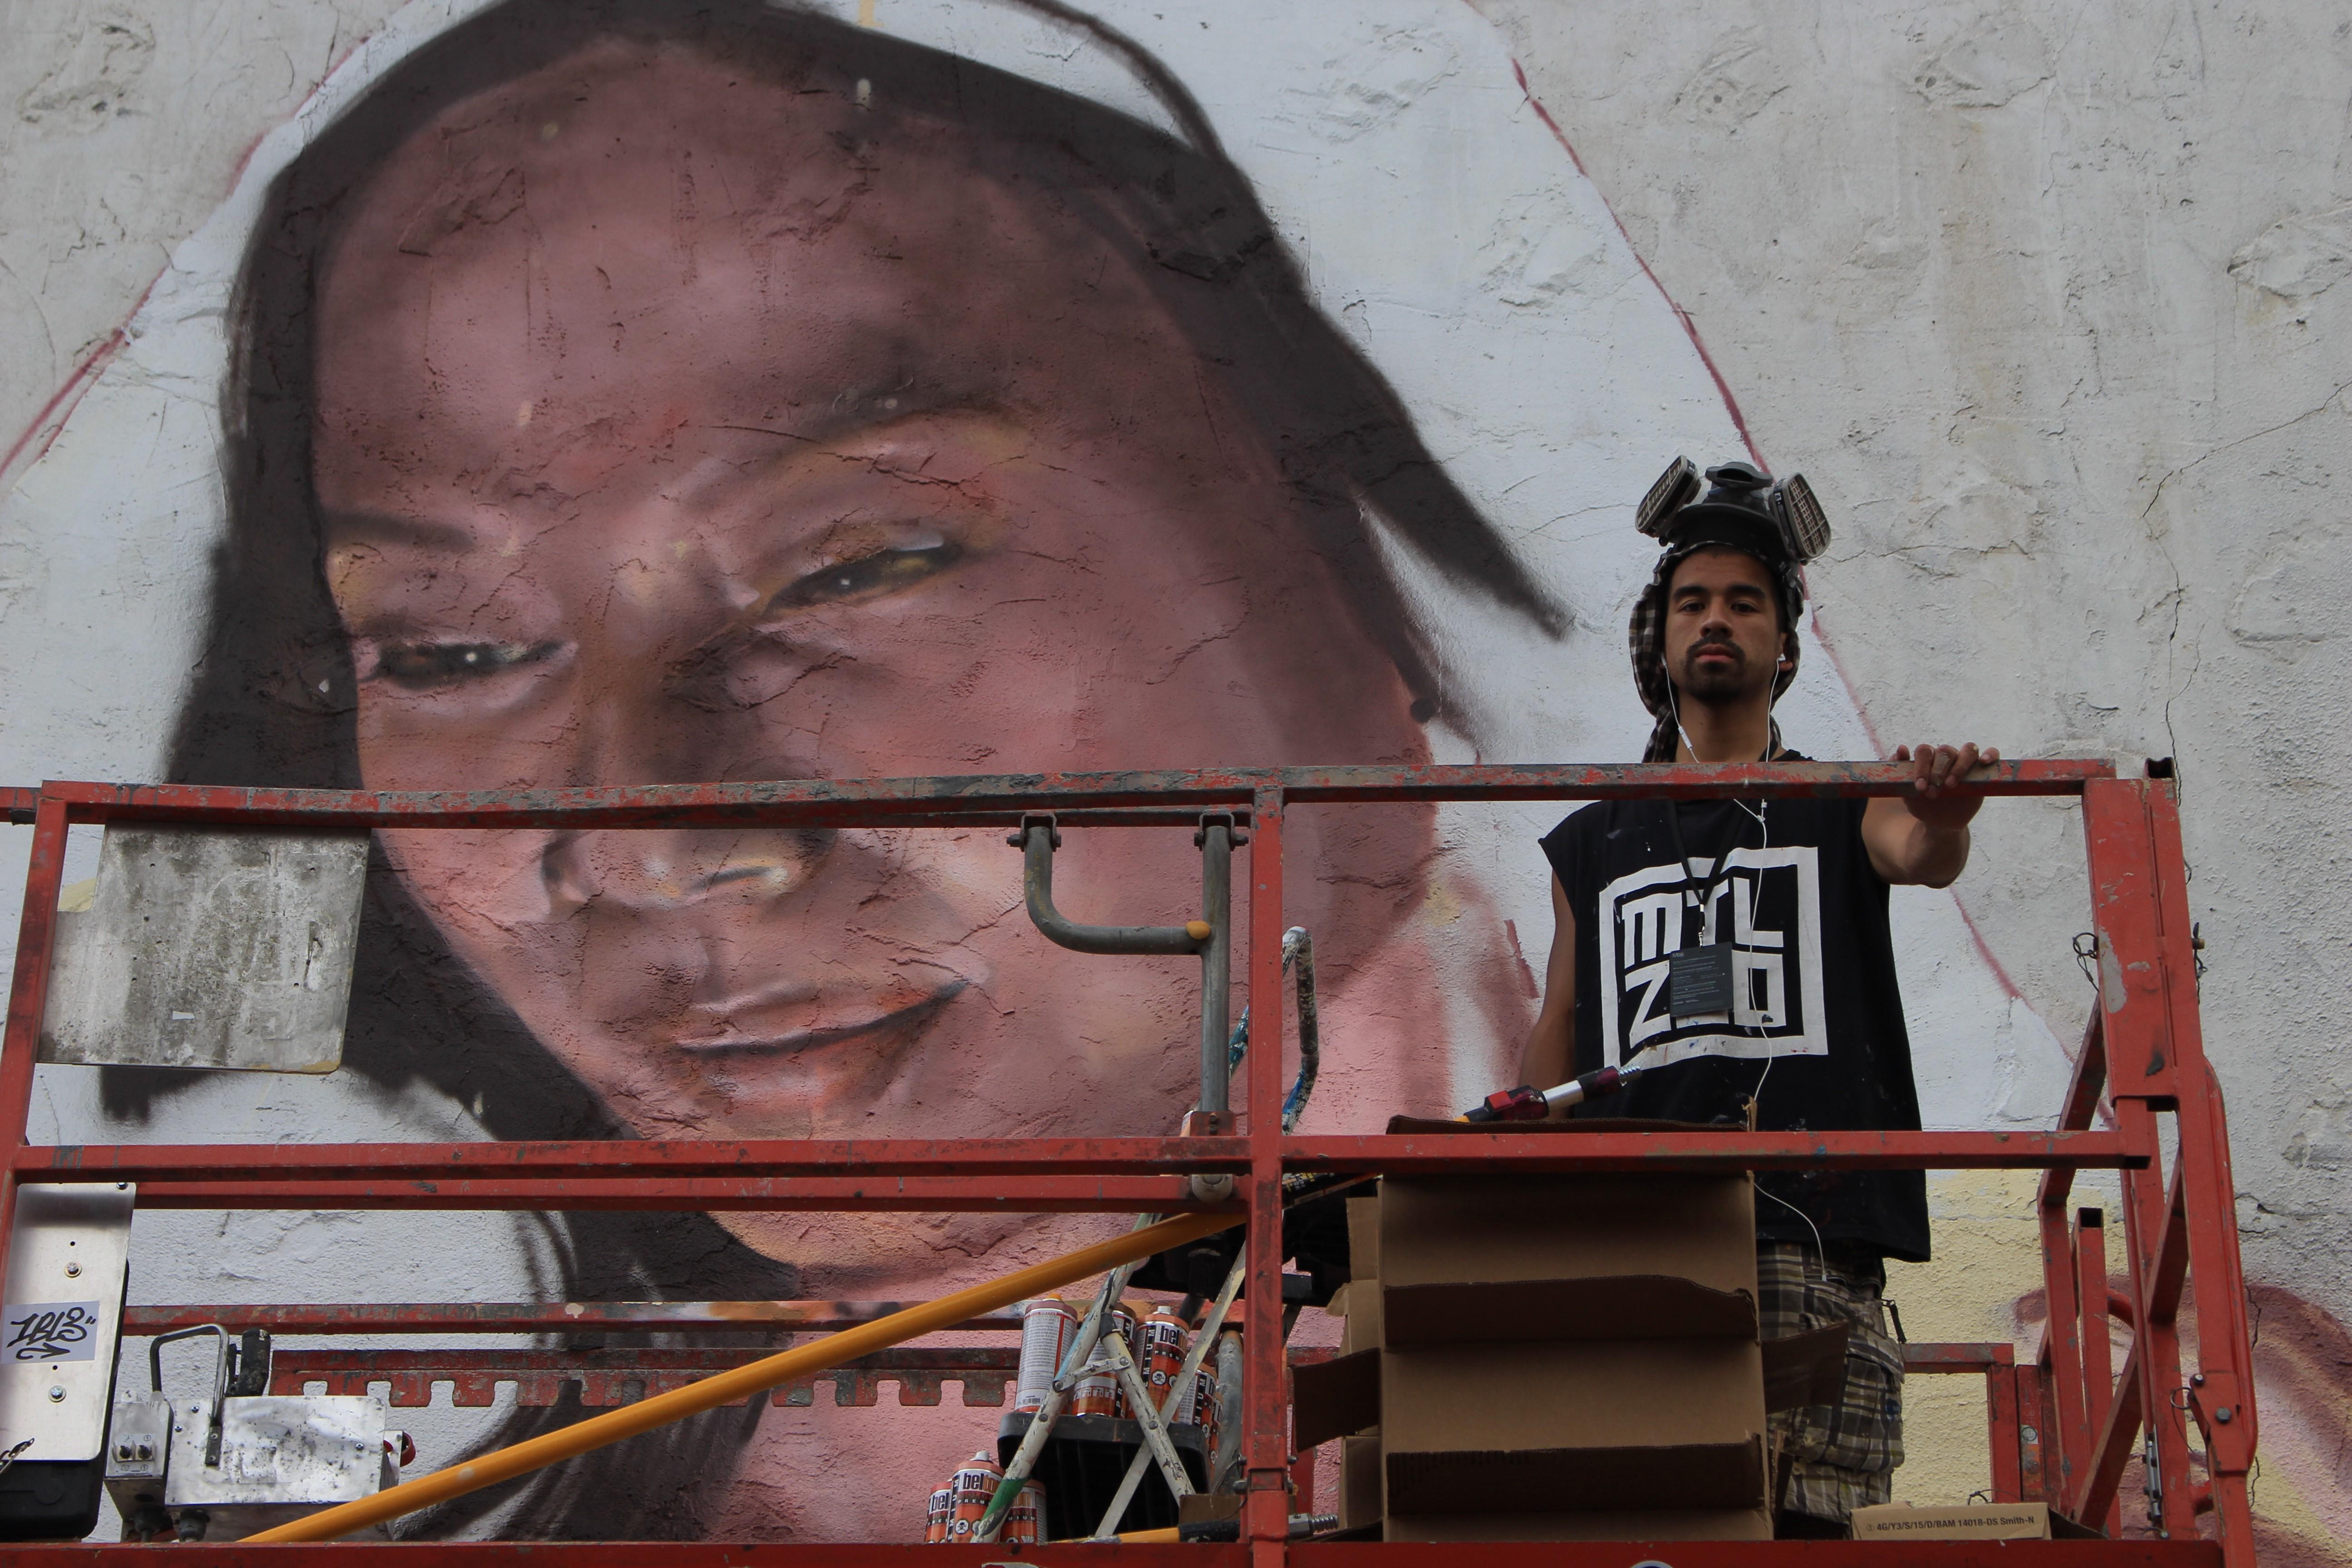 Festival MURAL : FONKi, le graffeur qui revisite l'art cambodgien